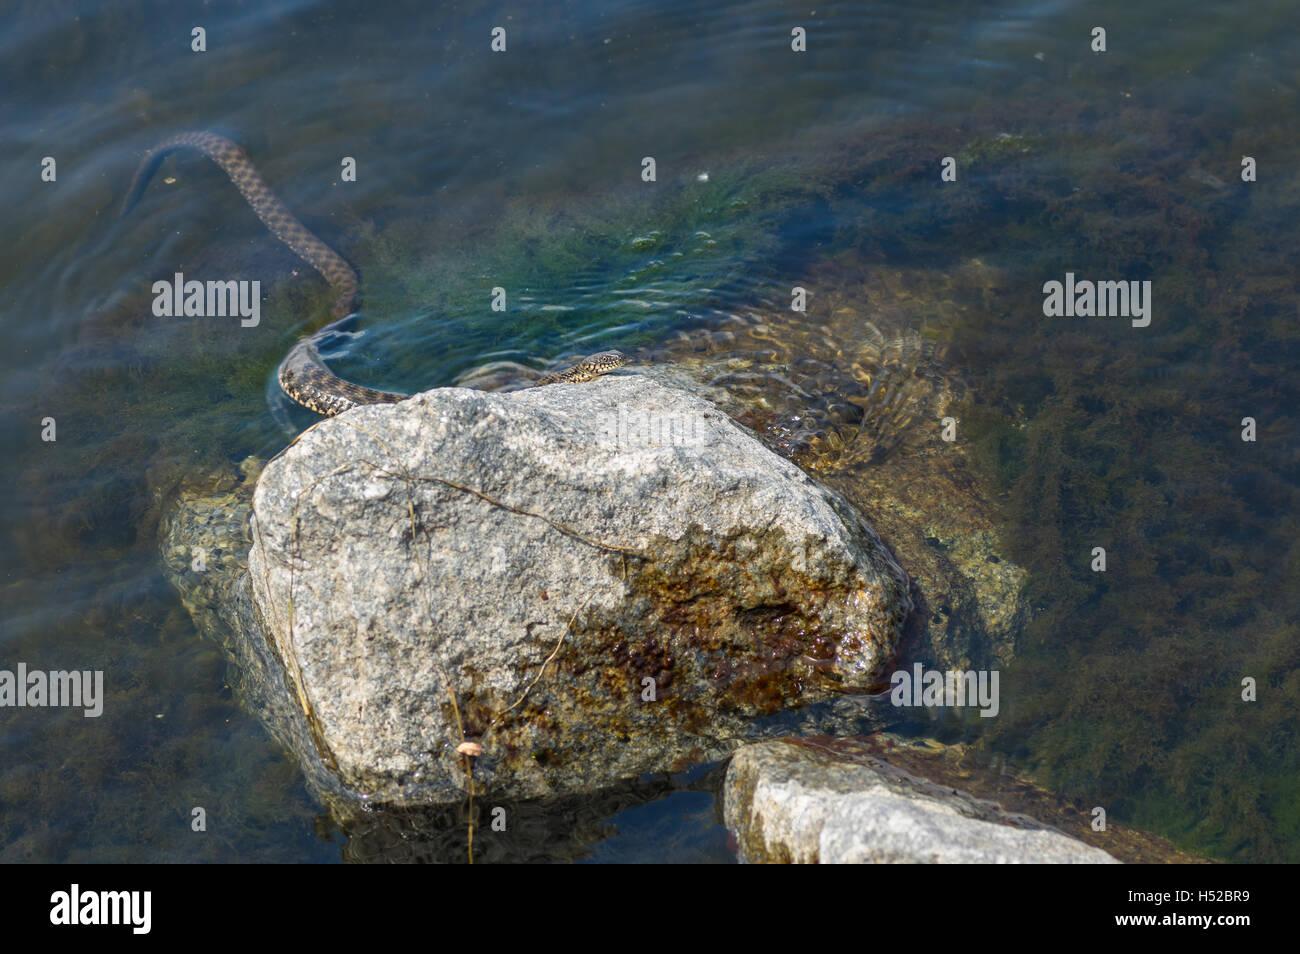 Dice snake (Natrix tessellata) hiding in Dnepr river on a riverside stone - Stock Image